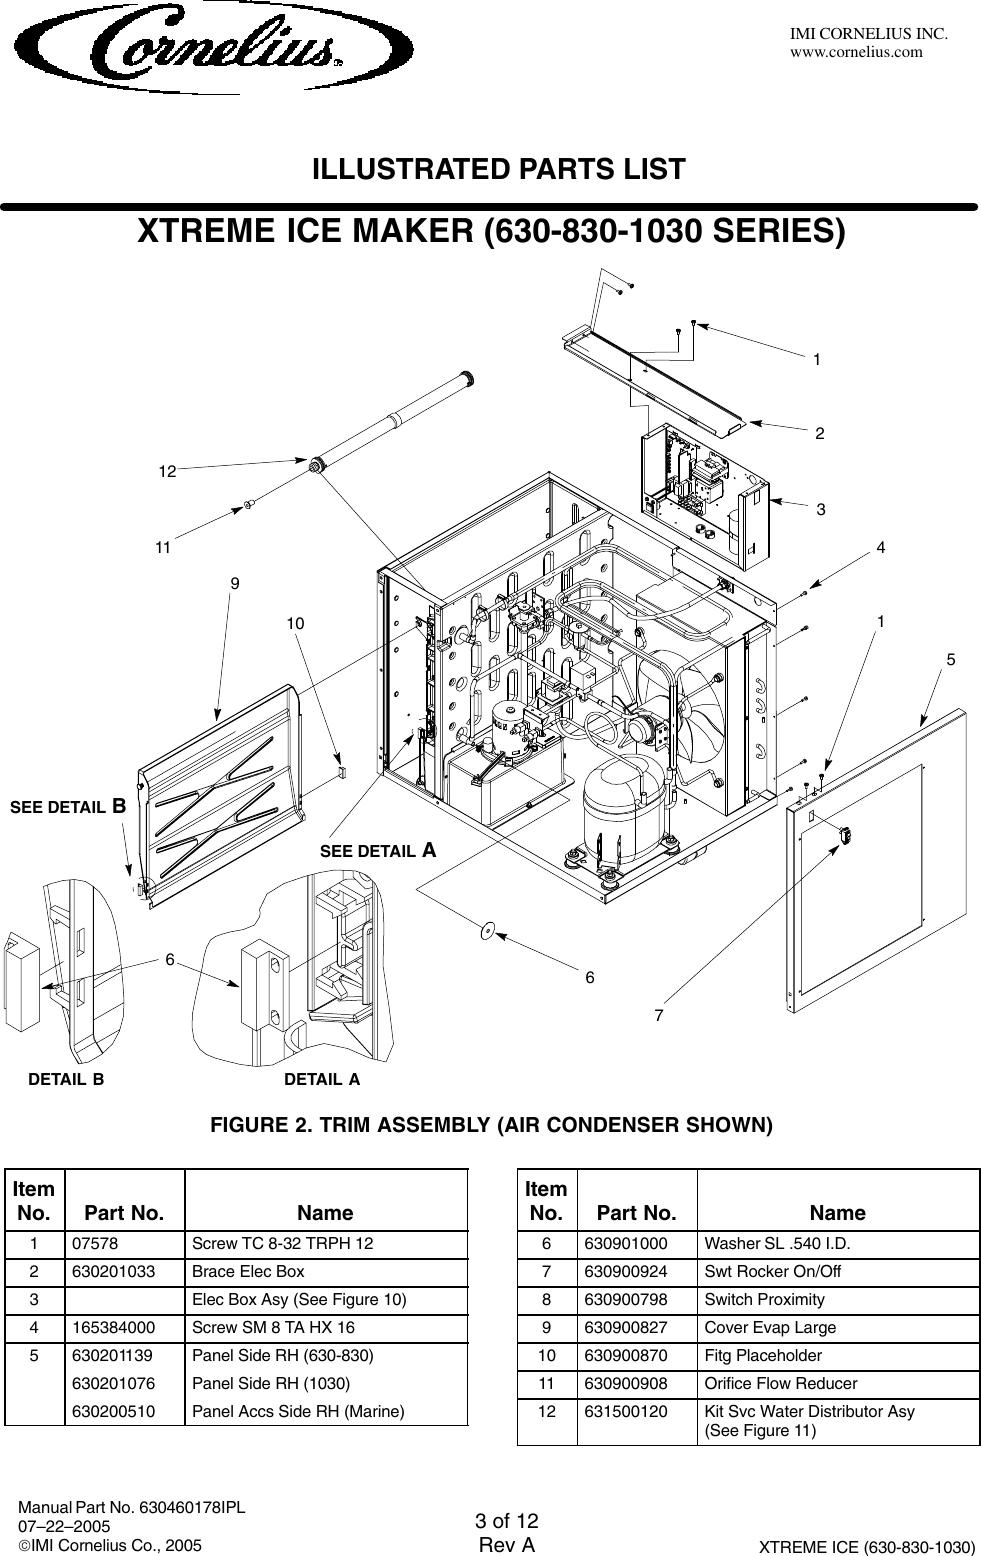 Cornelius 631806001 Users Manual on